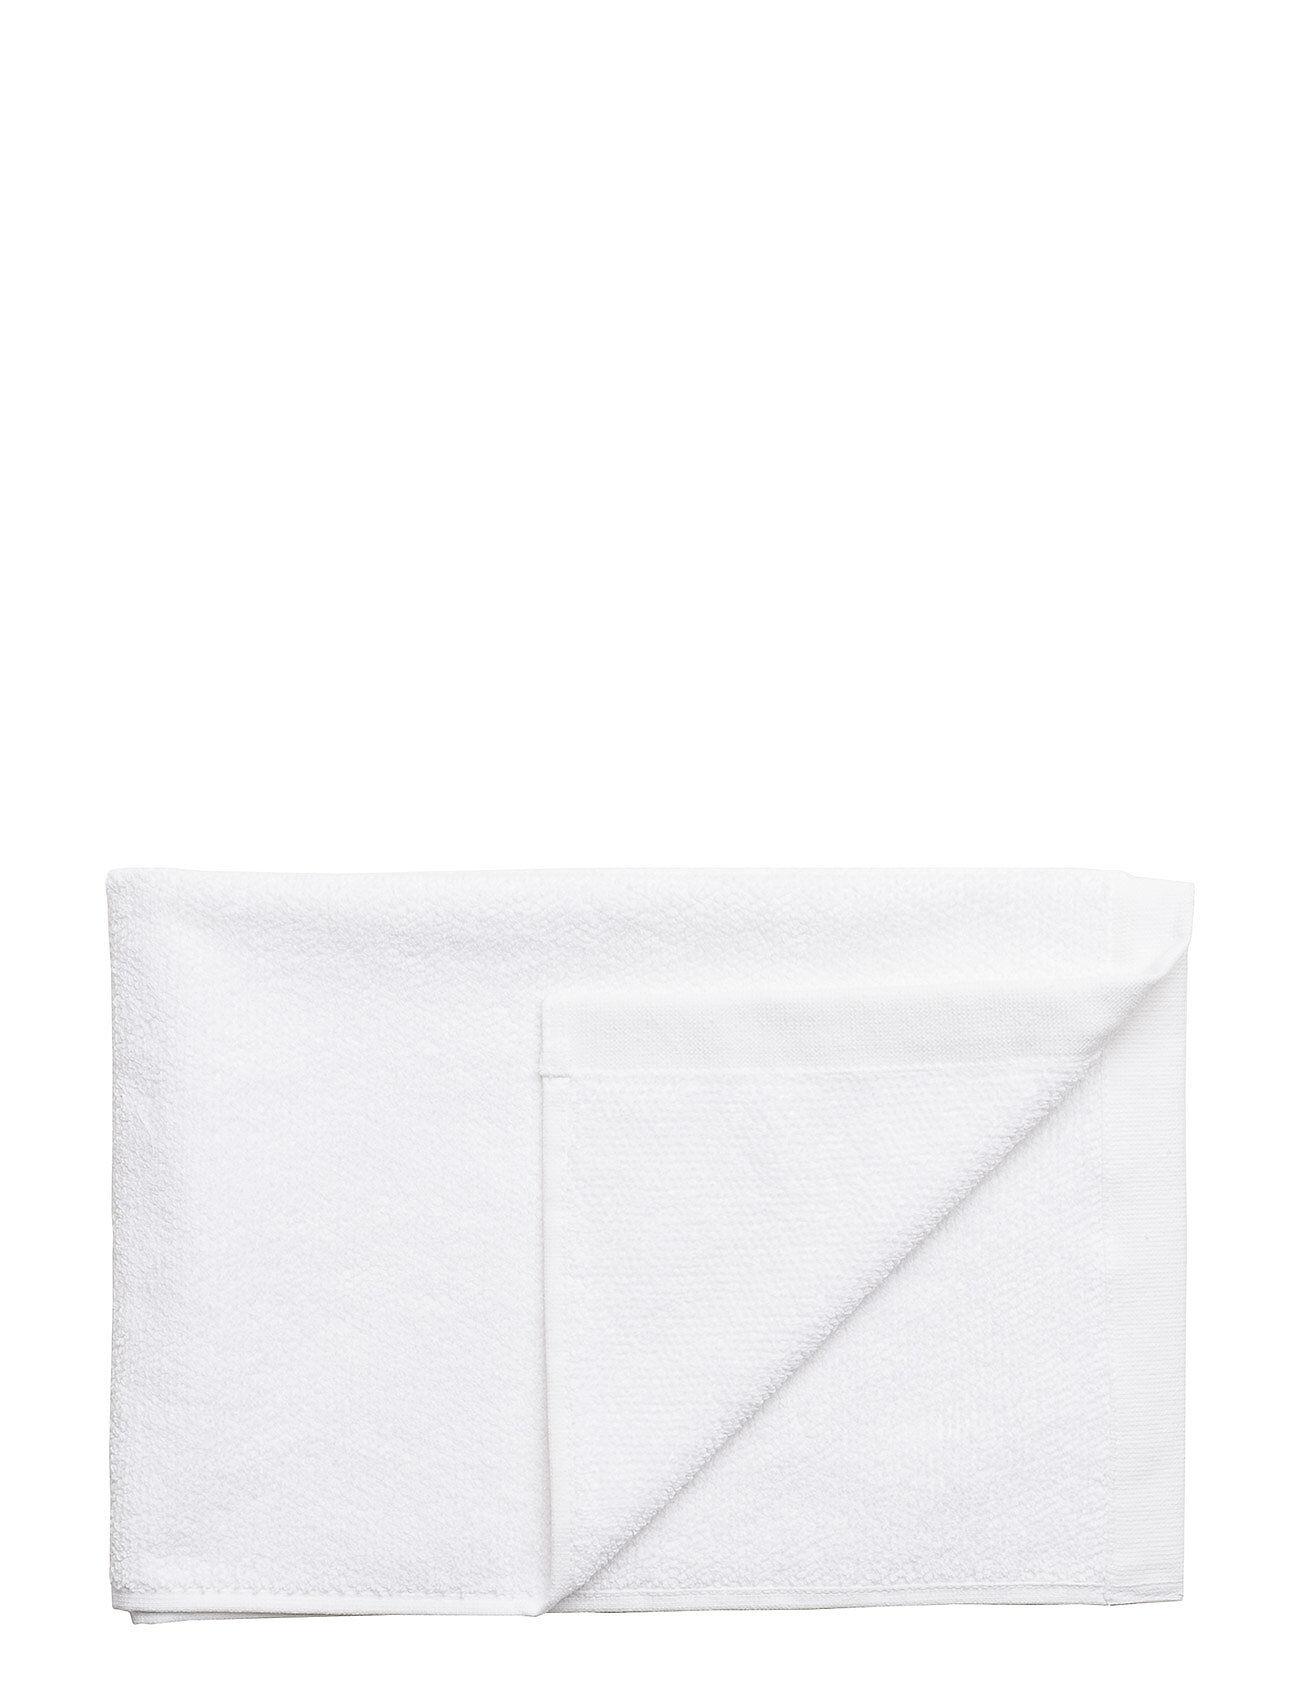 Gripsholm Towel Cotton Linen Home Bathroom Towels Valkoinen Gripsholm